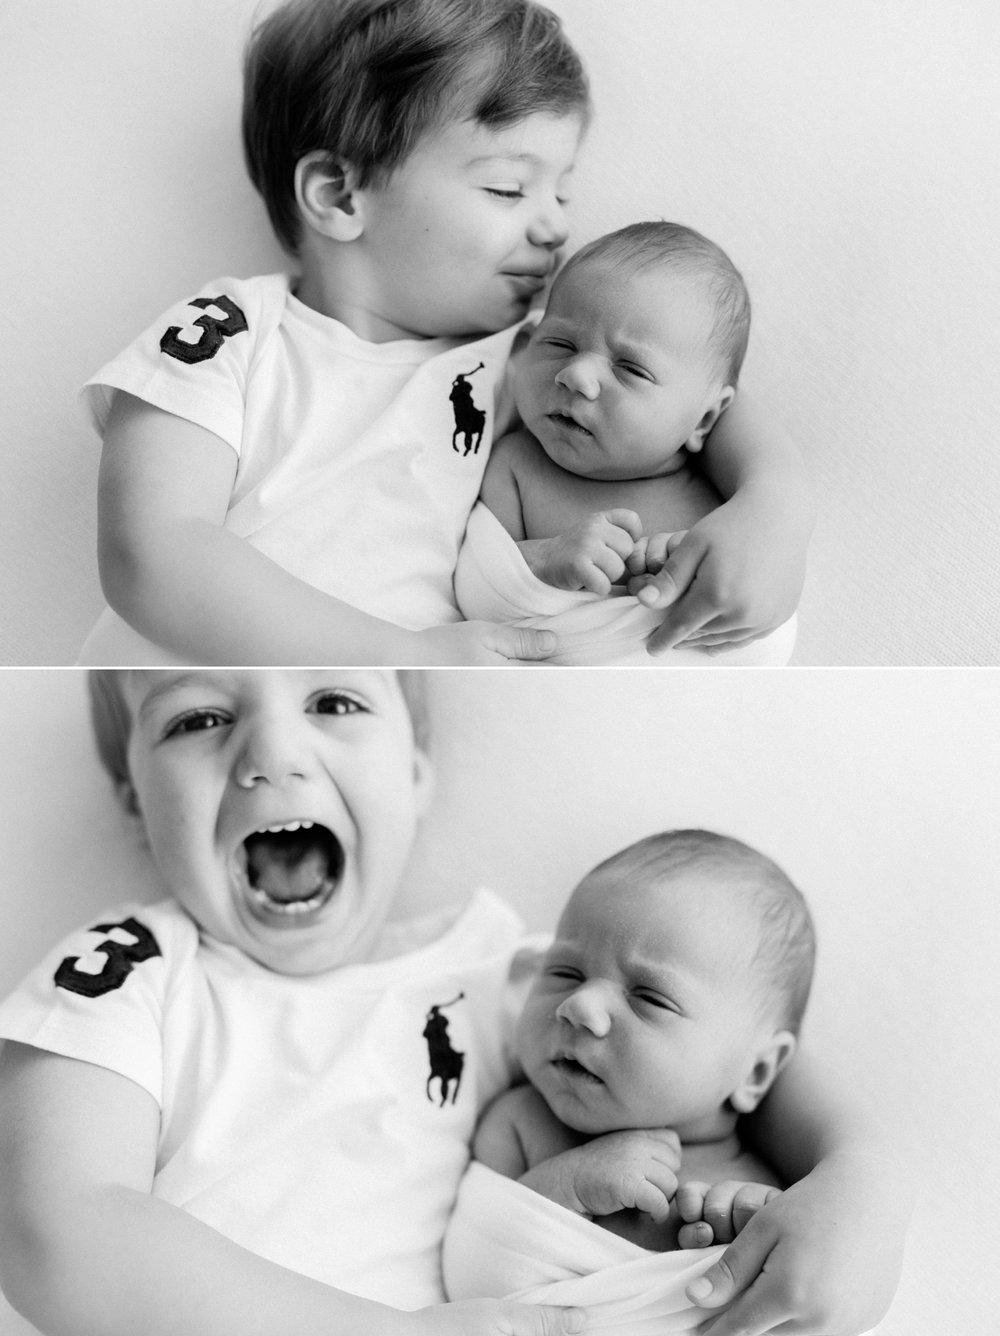 Baby Vivienne - Natural Newborn Photography in Adelaide - Simple, Modern and Beautiful Newborn Photographer - Katherine Schultz - www.katherineschultzphotography.com_0020.jpg